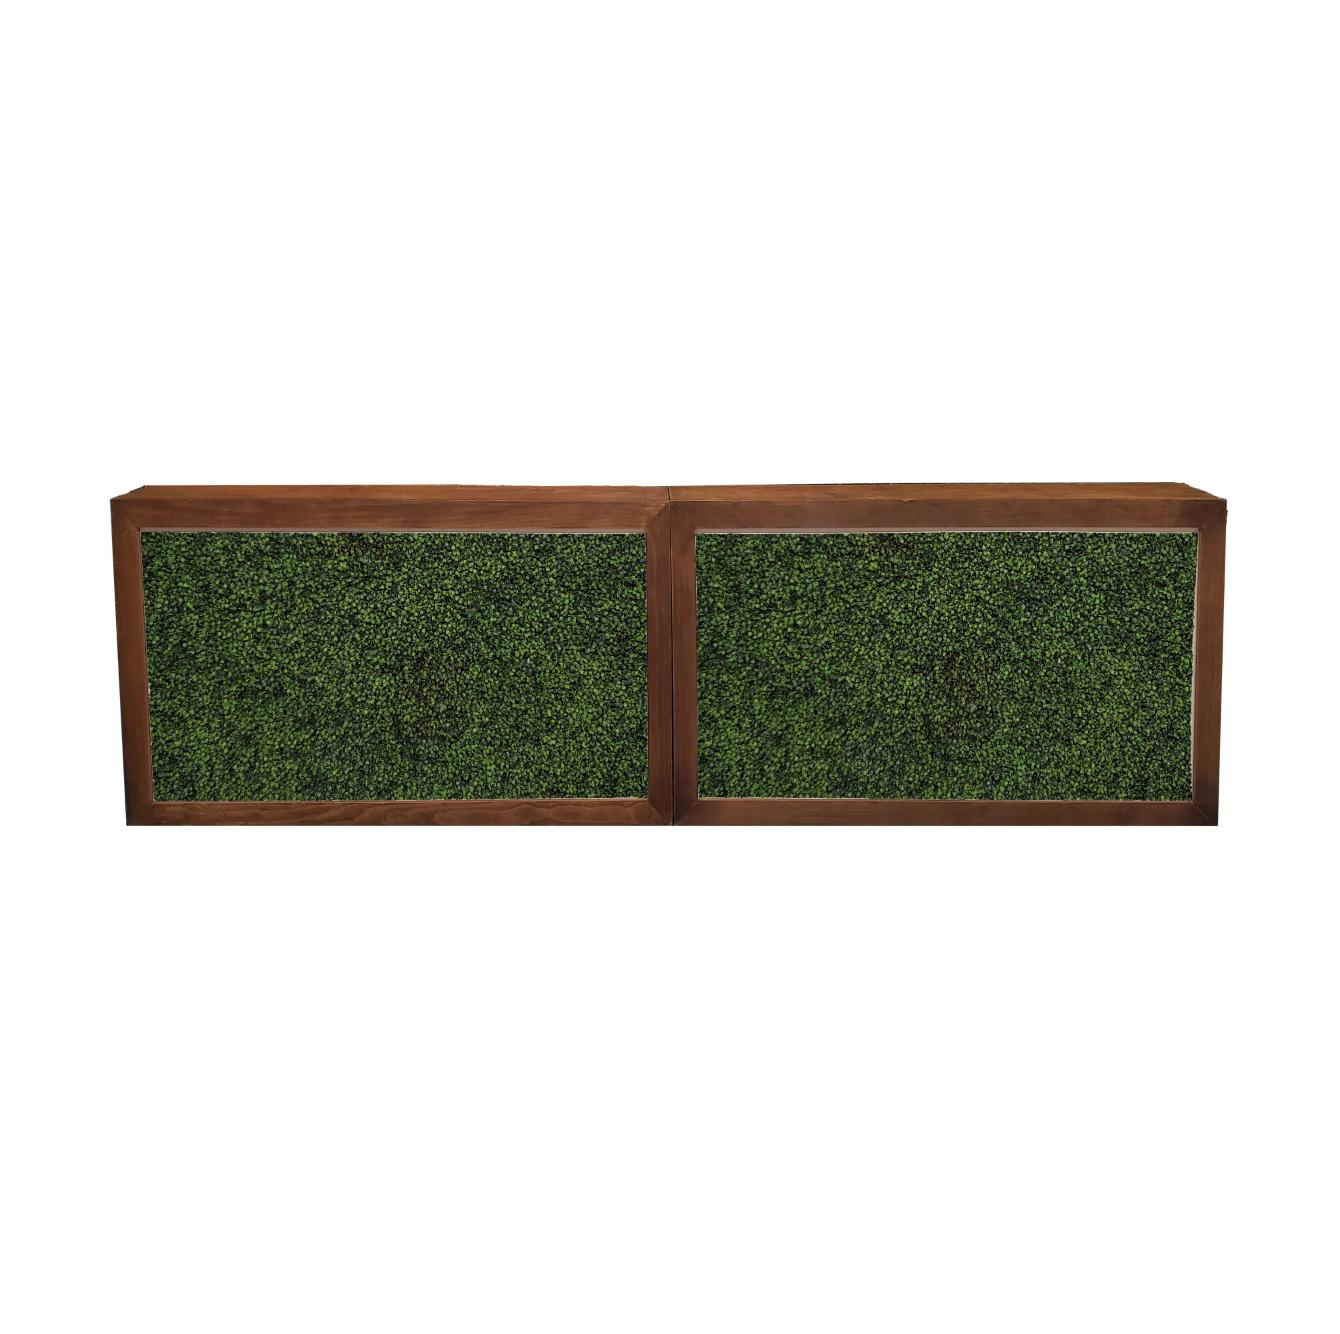 Double Wood Frame Bar/Hedge Insert $400